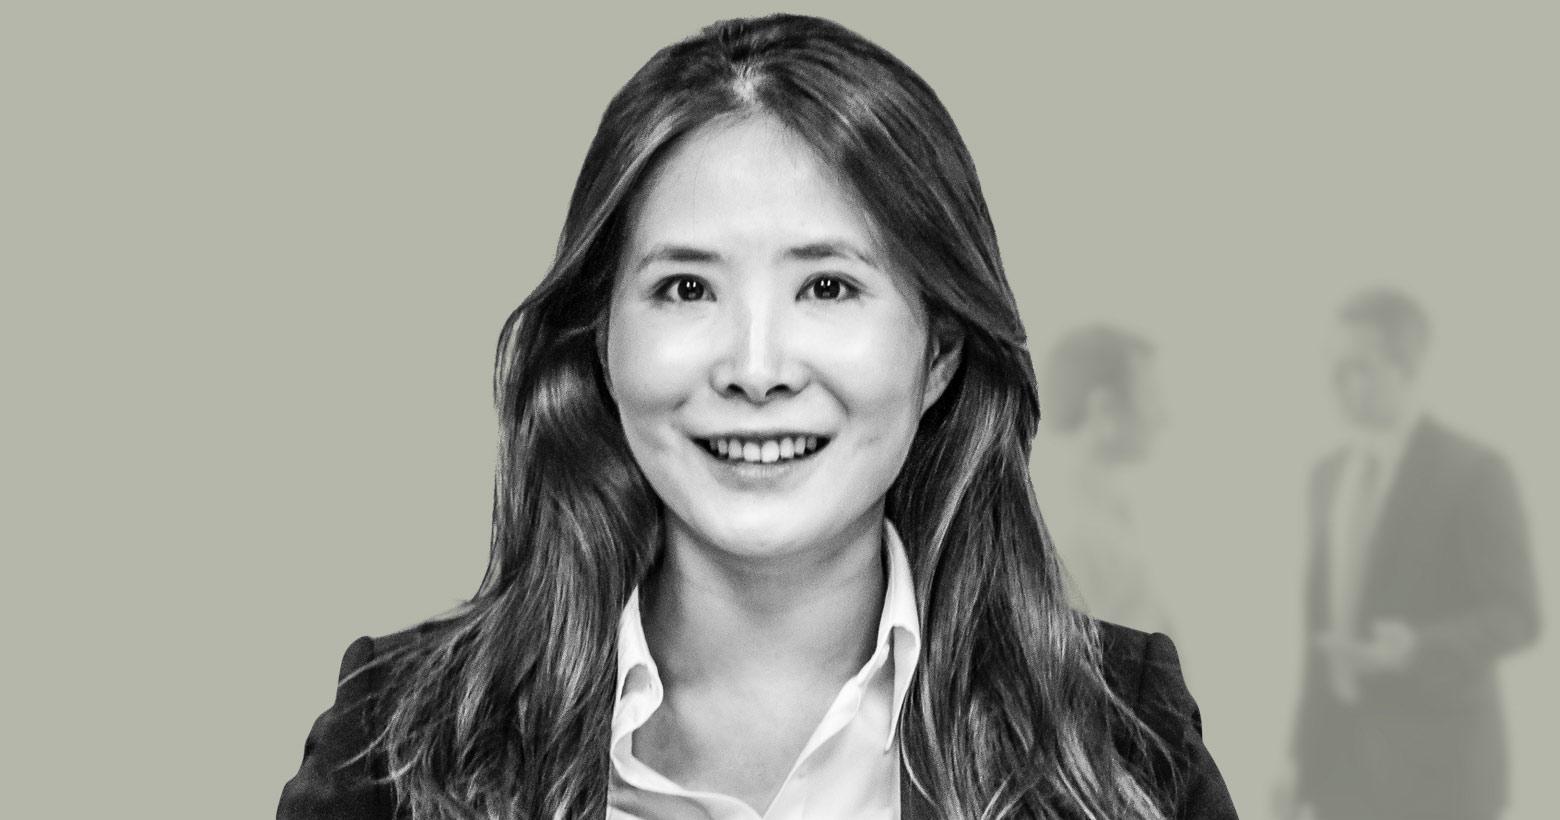 Jihyun Chung